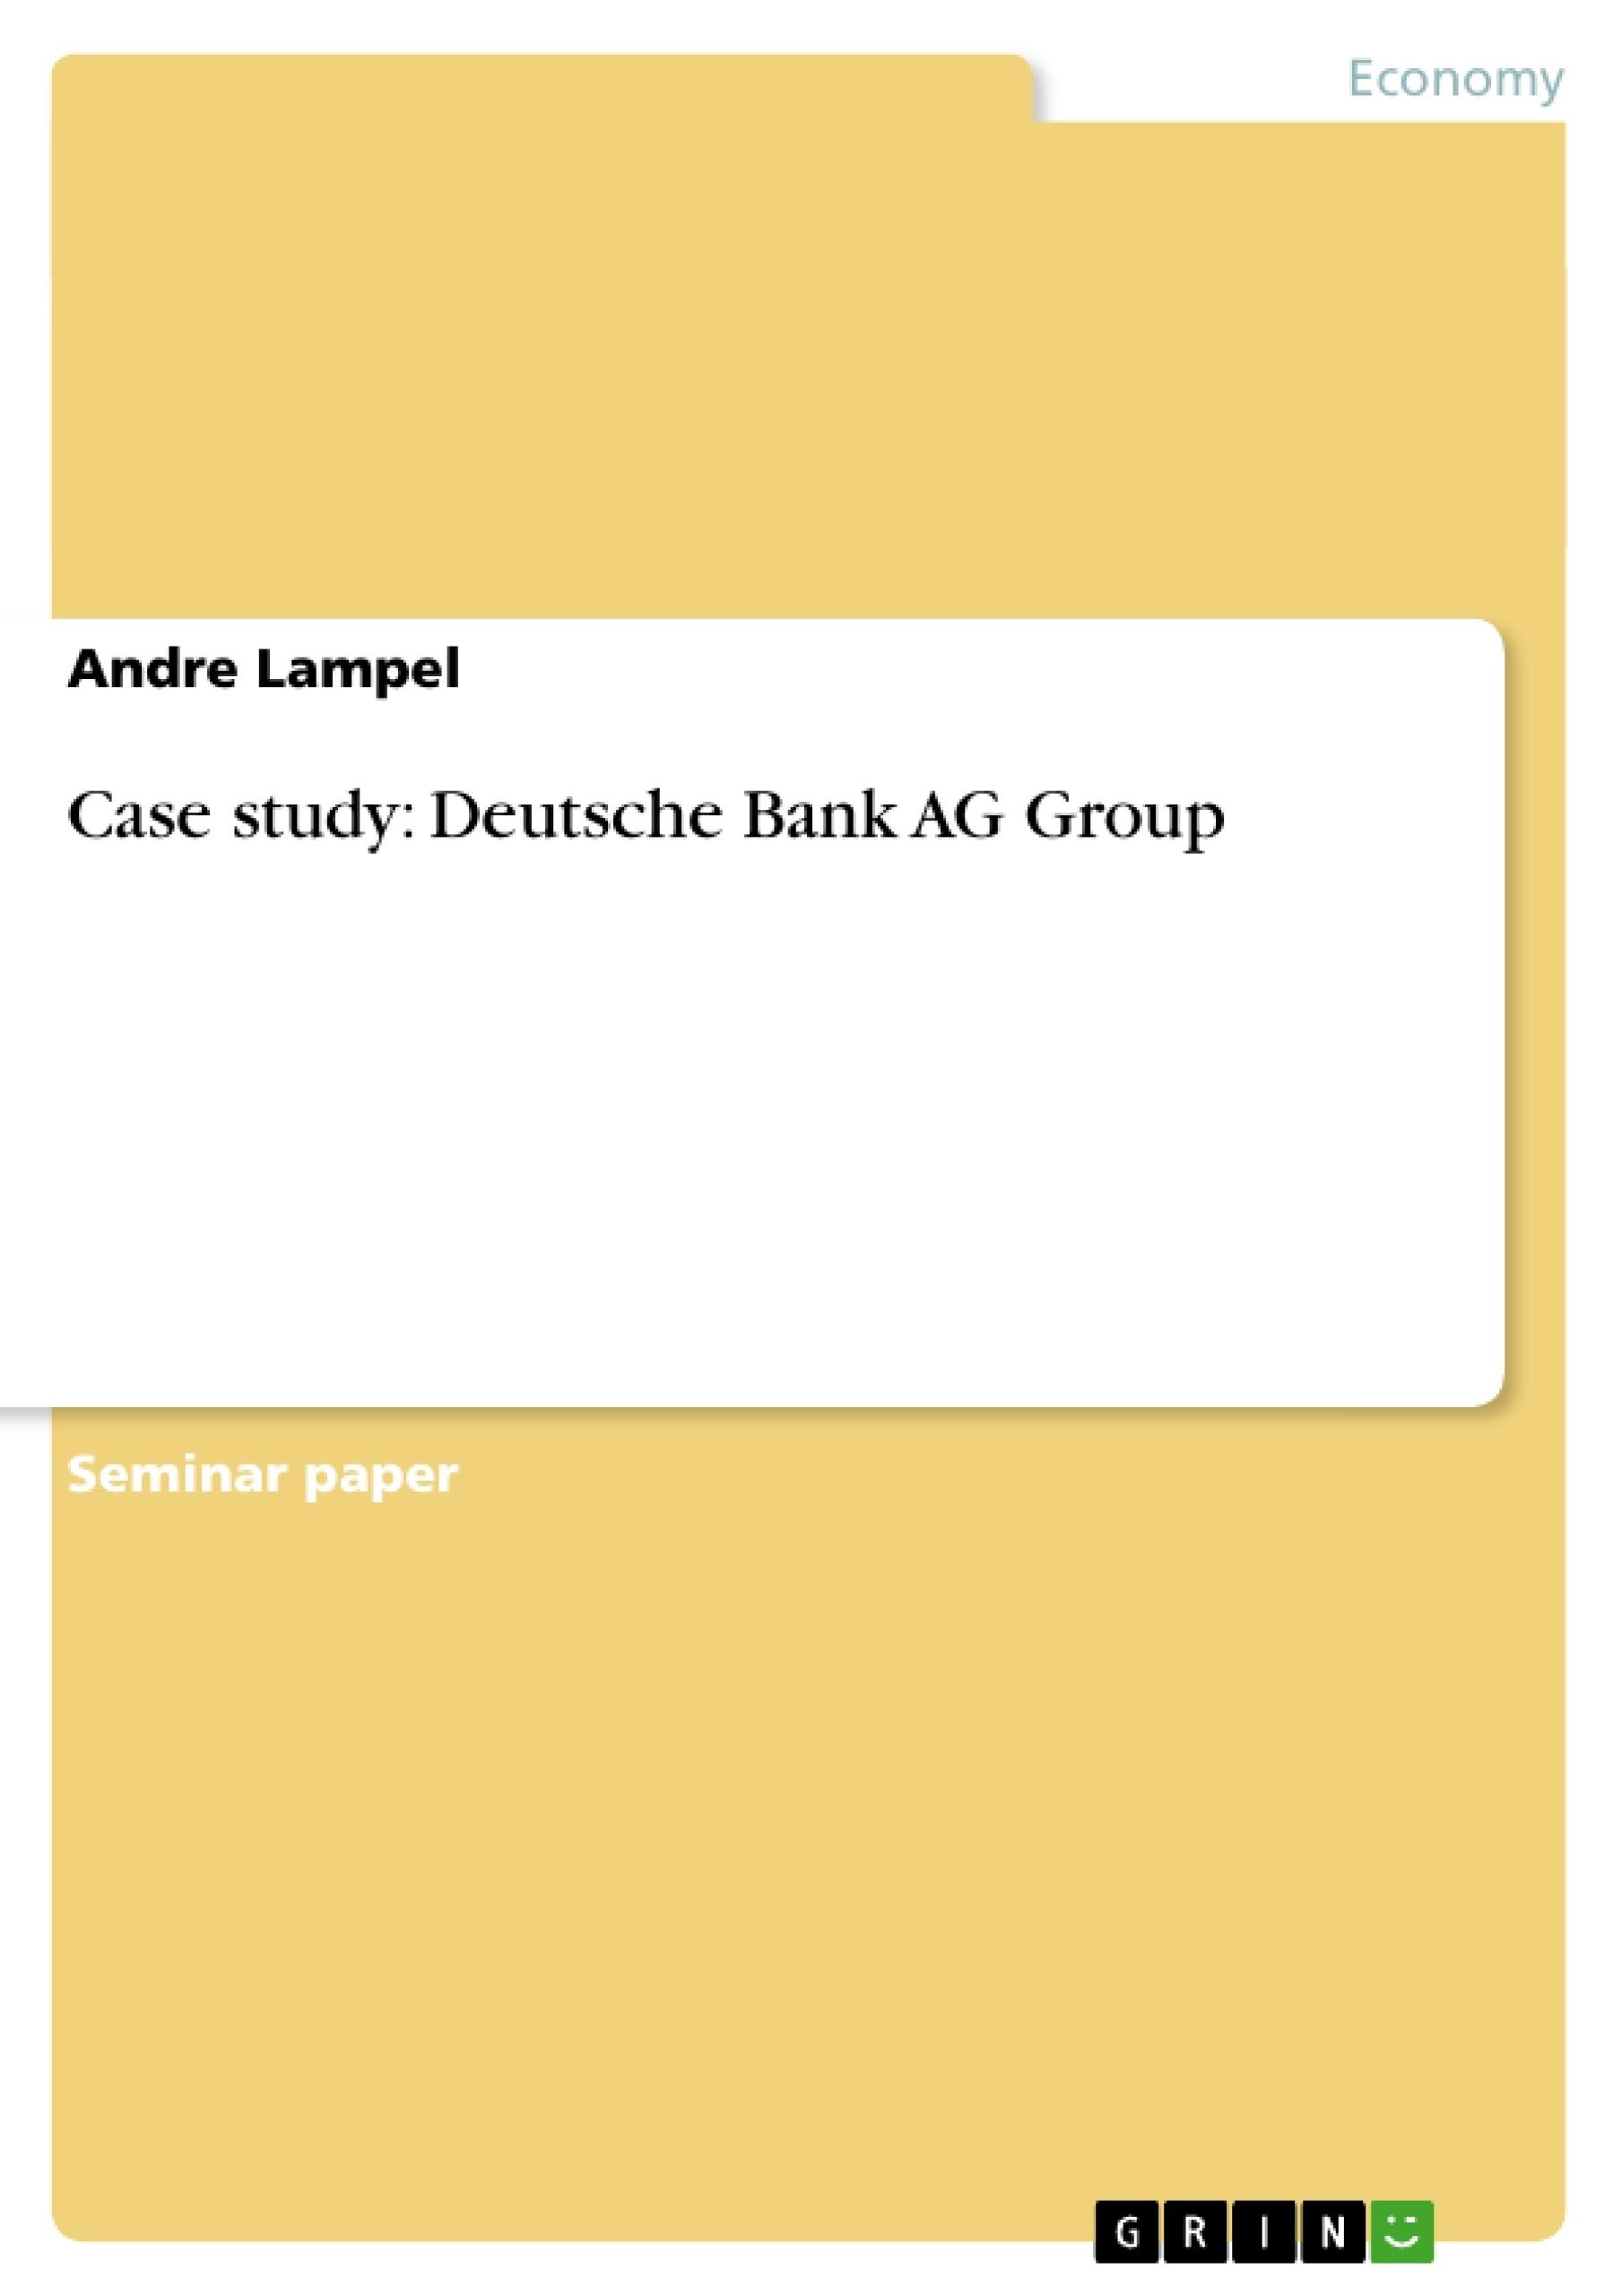 Title: Case study: Deutsche Bank AG Group